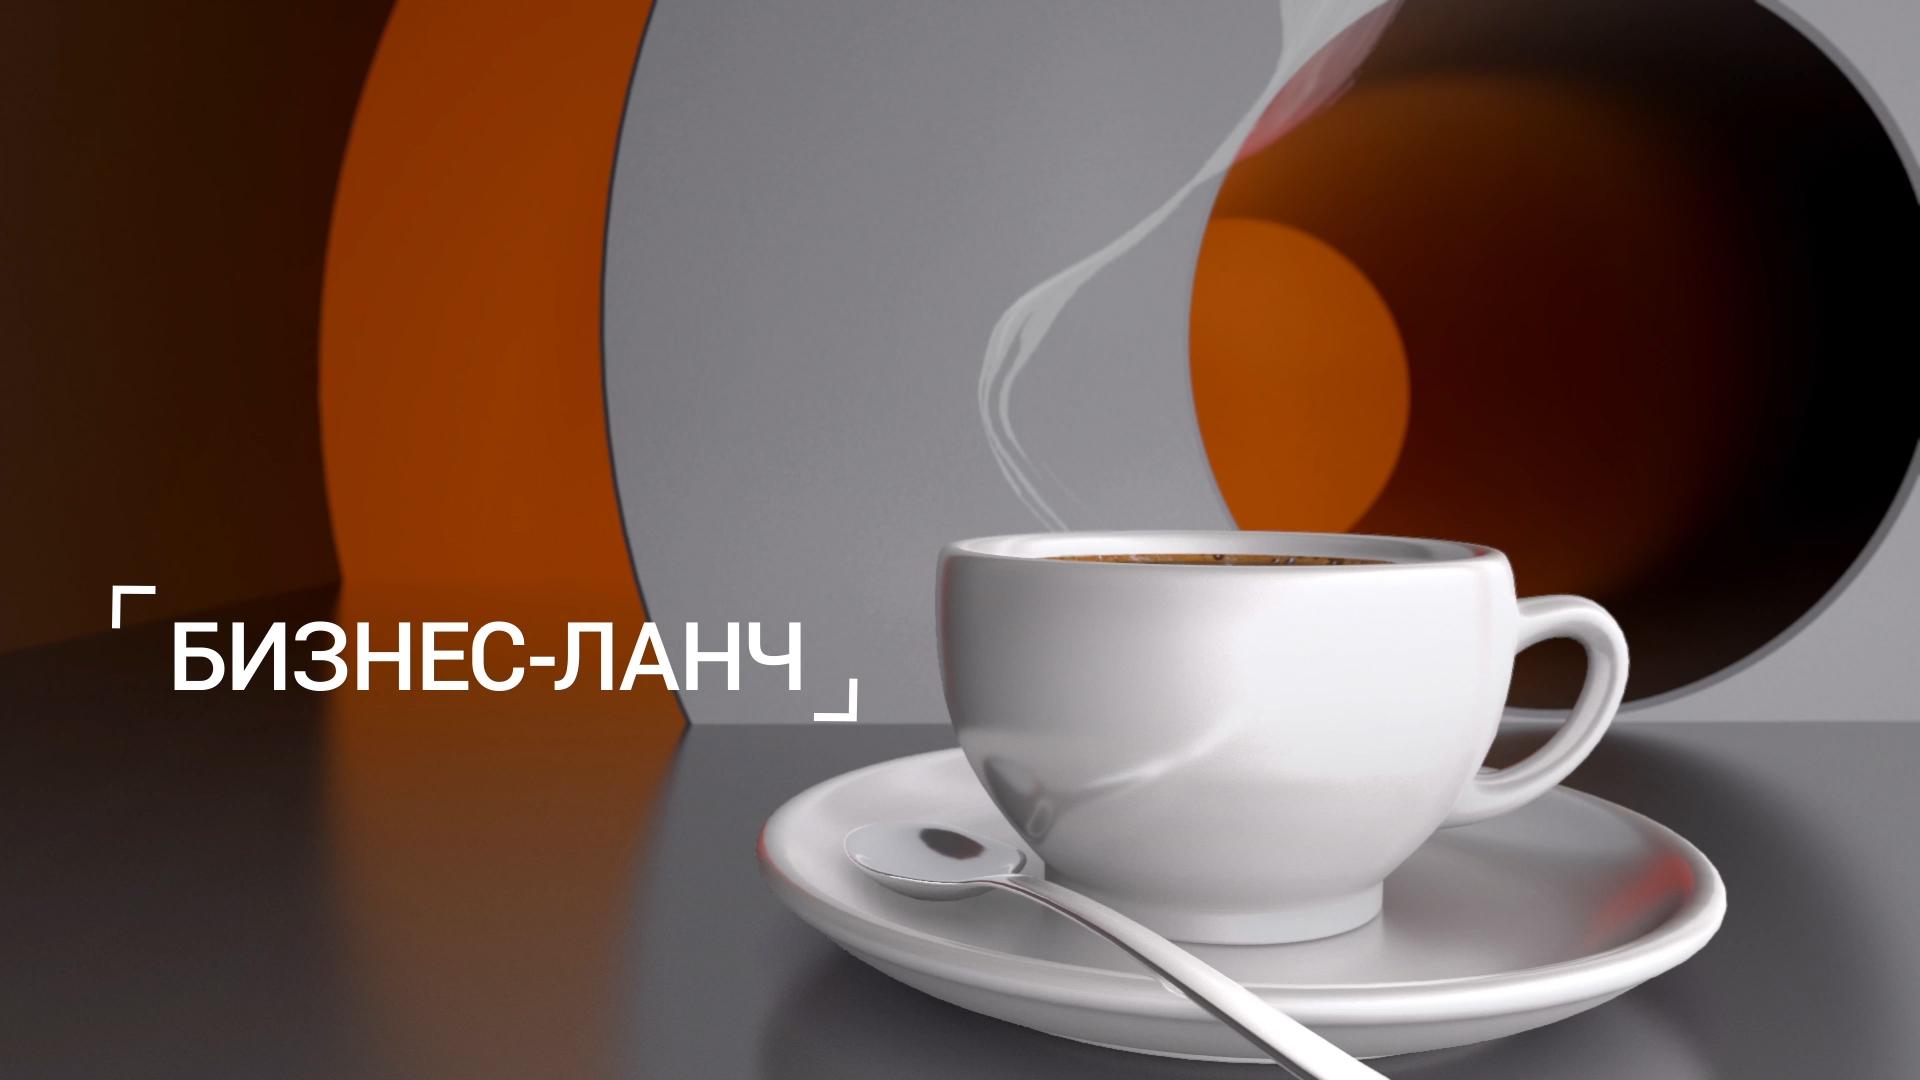 https://inbusiness.kz/ru/images/programbig/1/images/OUsLZHnK.jpg